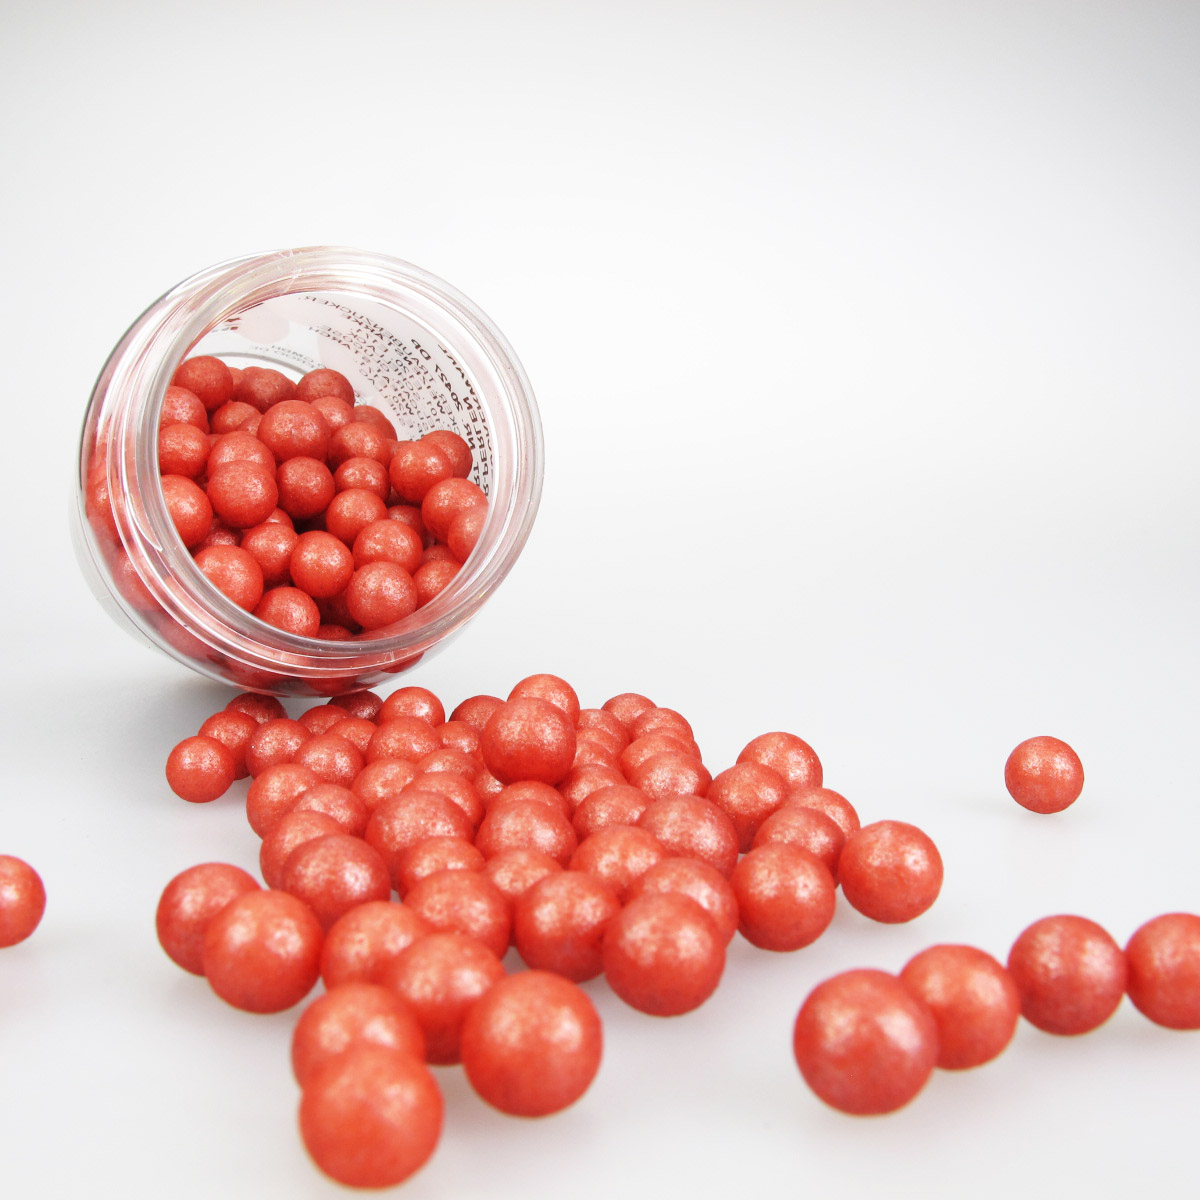 Bakeria- Zuckerperlen Gross Rot, 70g- Rote Zuckerperlen